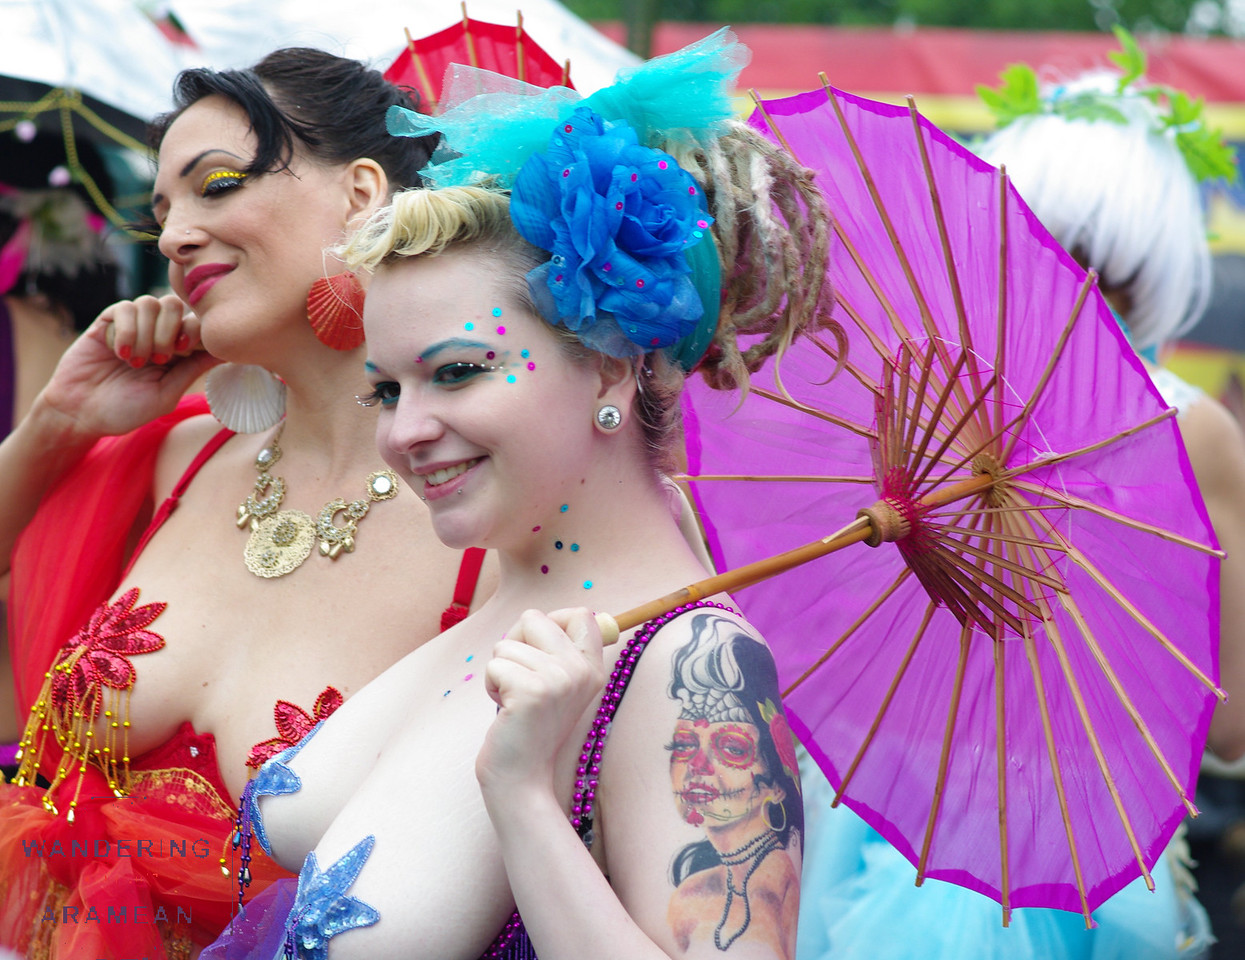 More of the parasol ladies